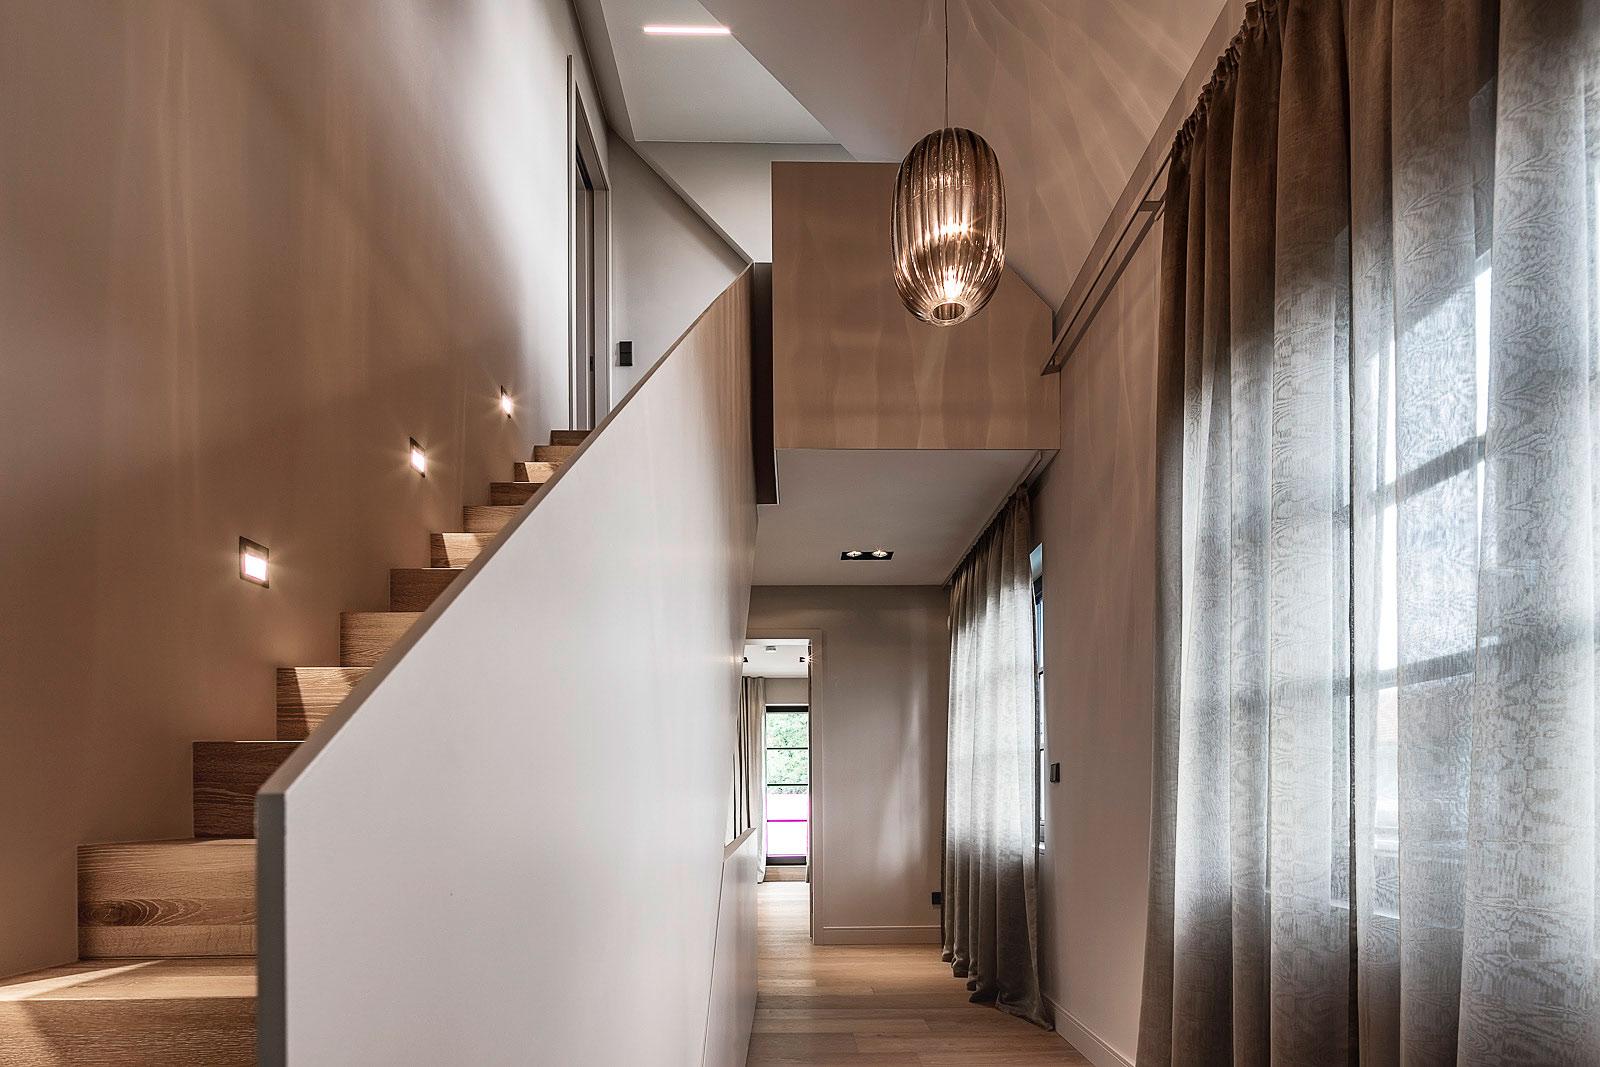 Architekturfotografie Innenraum, Treppenhaus, Innenarchitektur, Foto